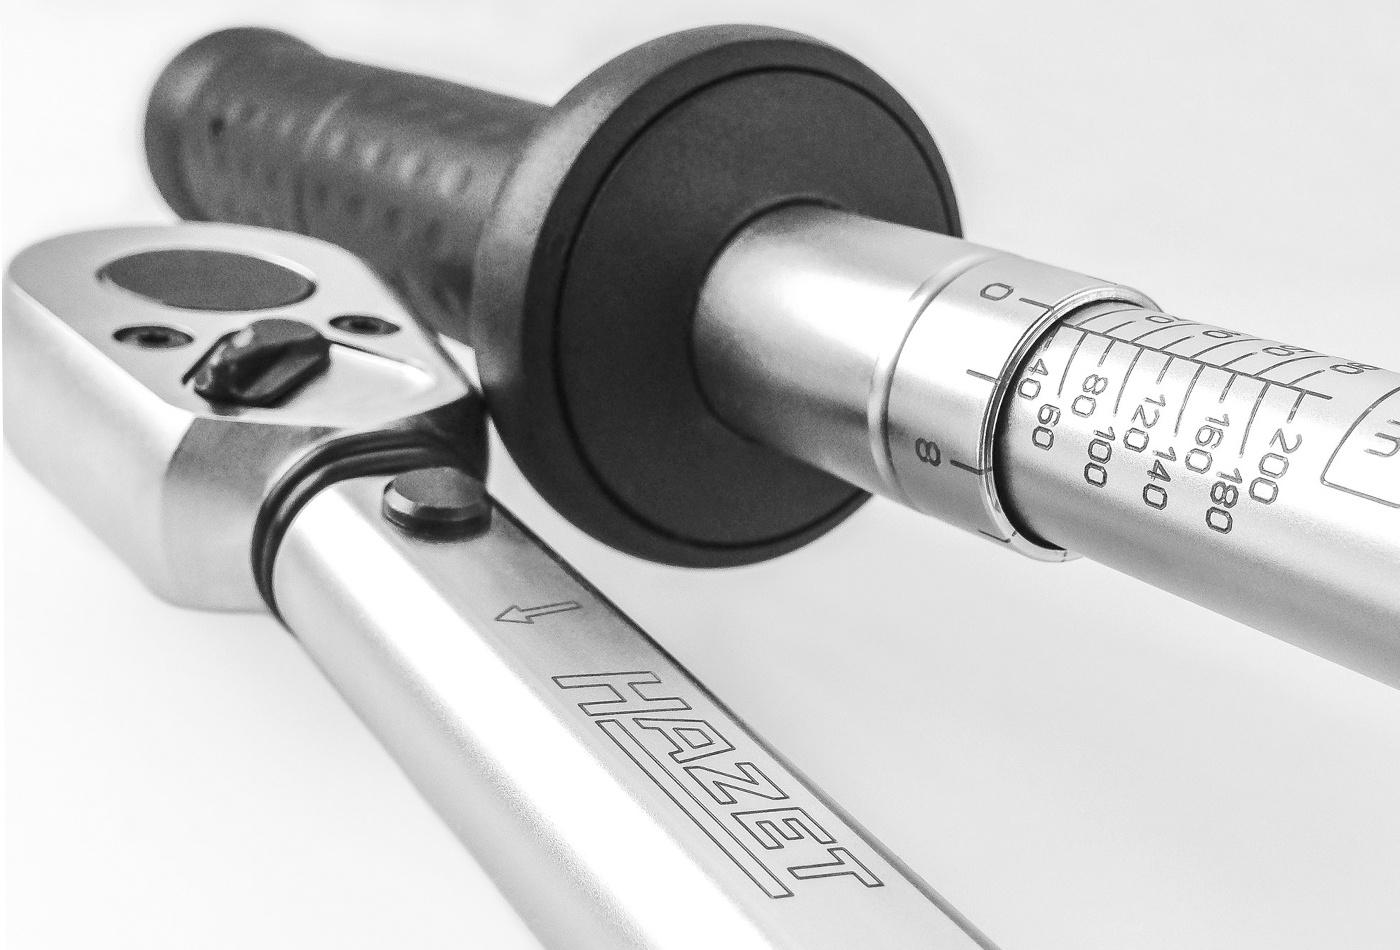 Hazet Tork Anahtarları Sistem 6000 1CT/2CT ±%2 [ 1 - 800 N.m ]